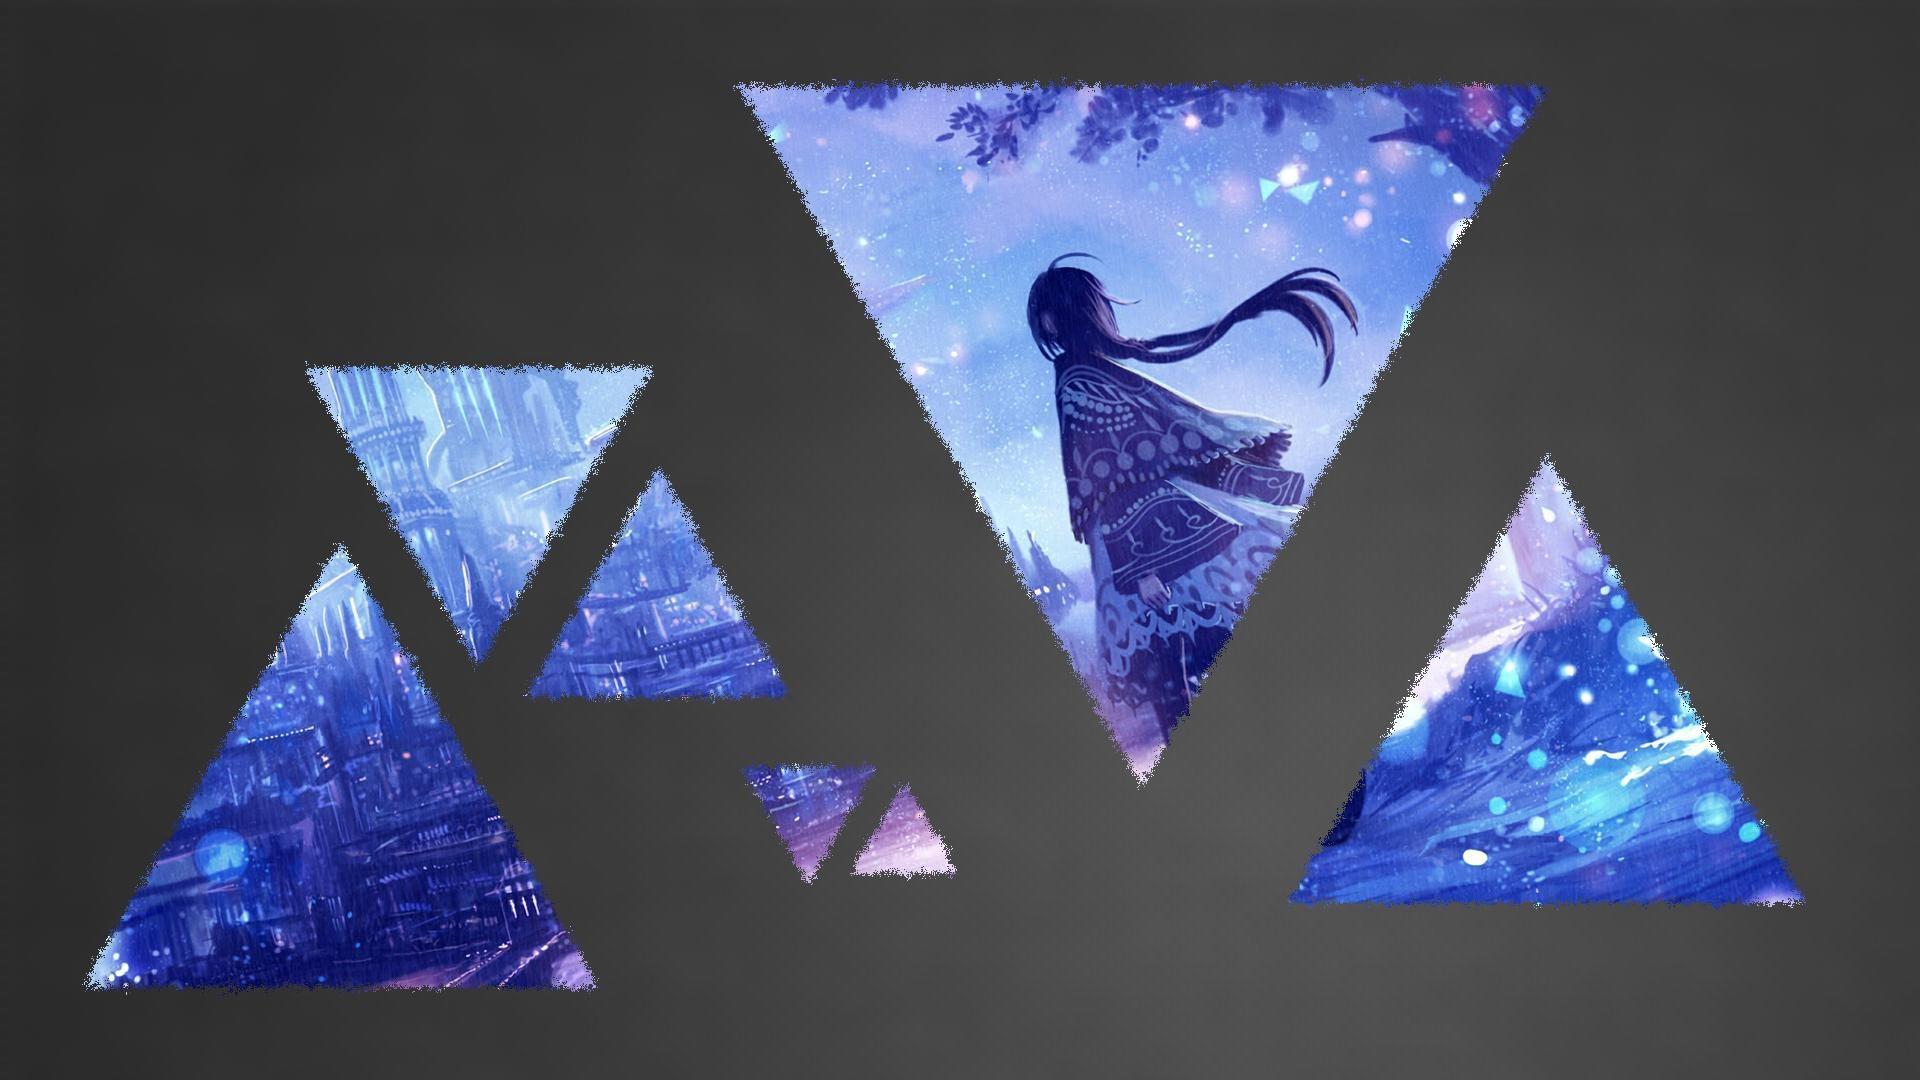 Anime Girls For Windows computer wallpaper